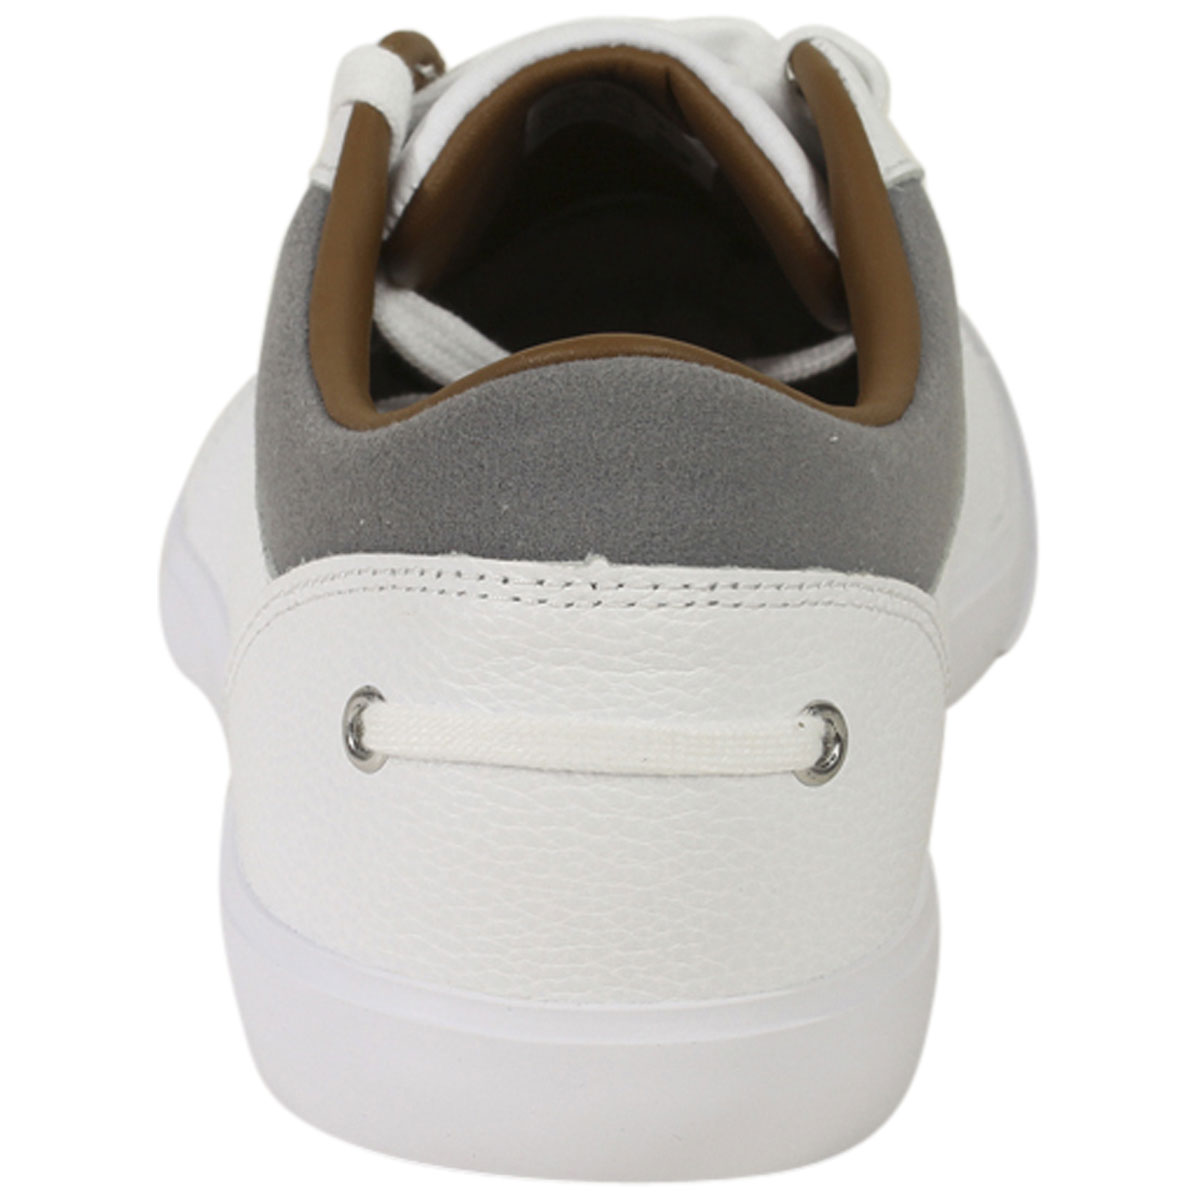 Lacoste-Men-039-s-Bayliss-118-Sneakers-Shoes thumbnail 17